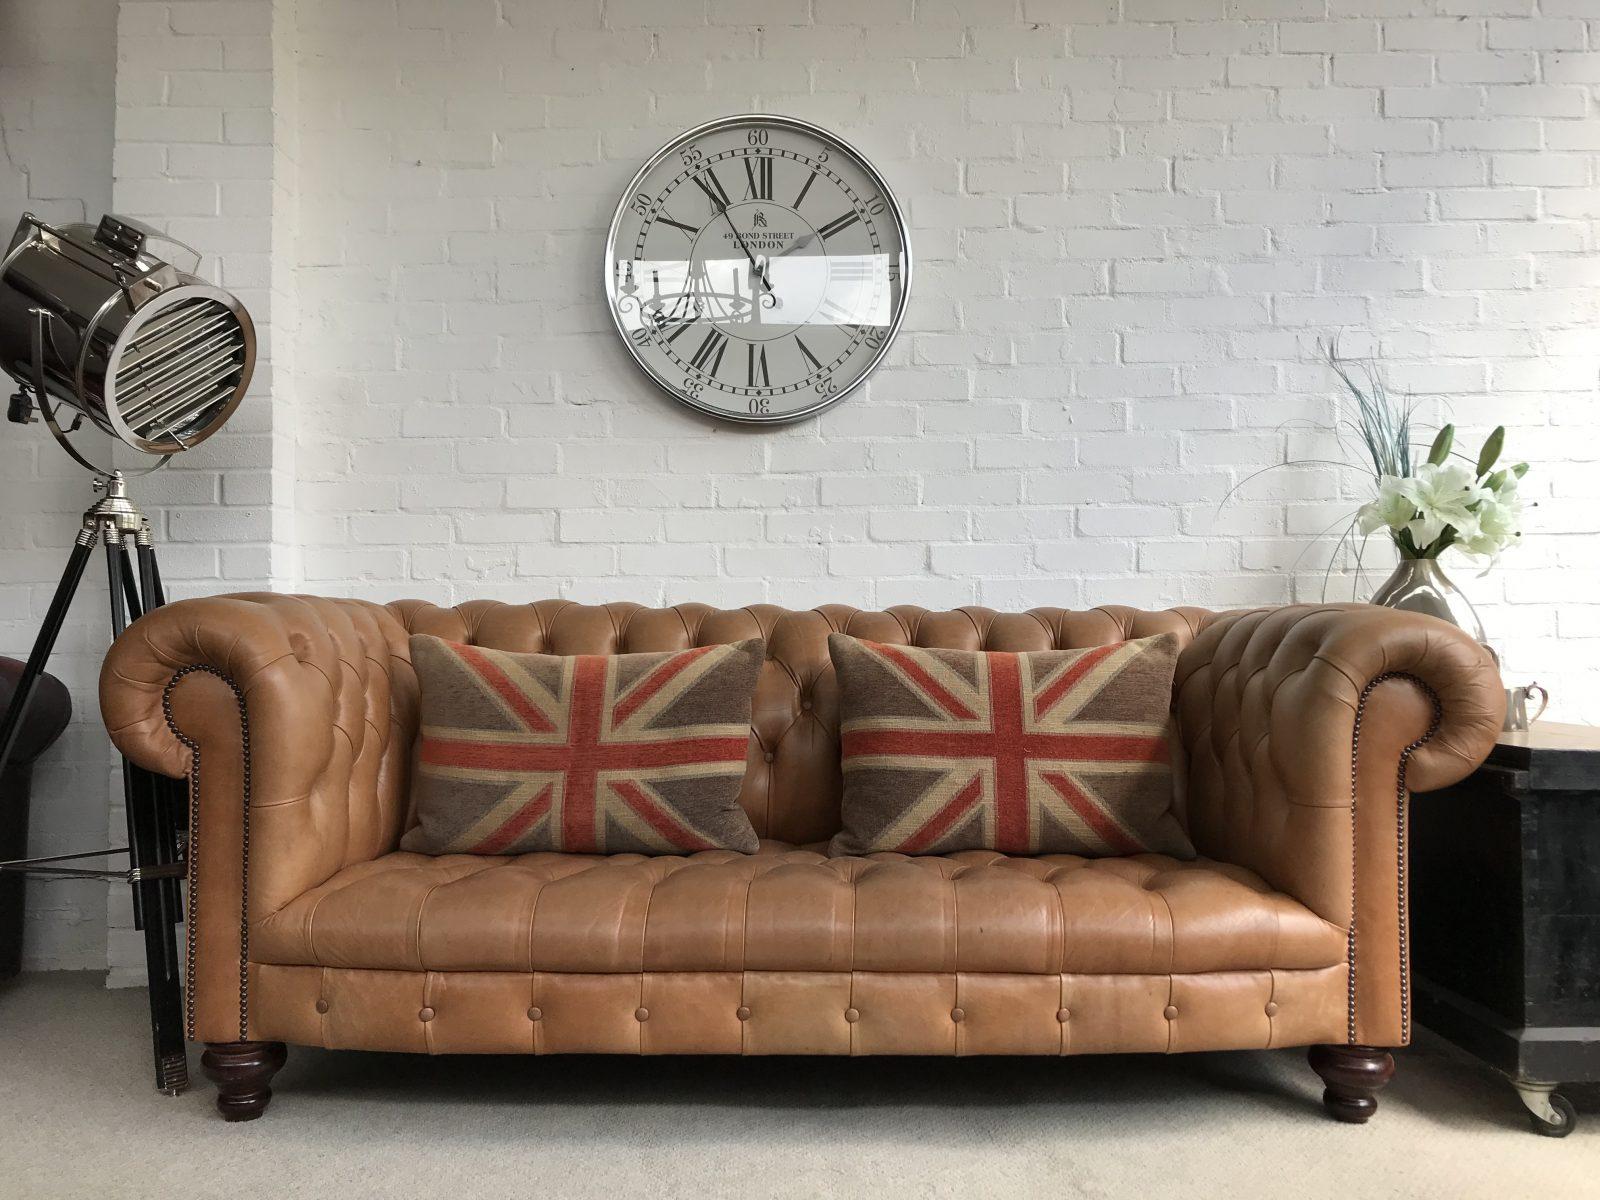 Stunning Saddle Tan Chesterfield Sofa. SOLD…